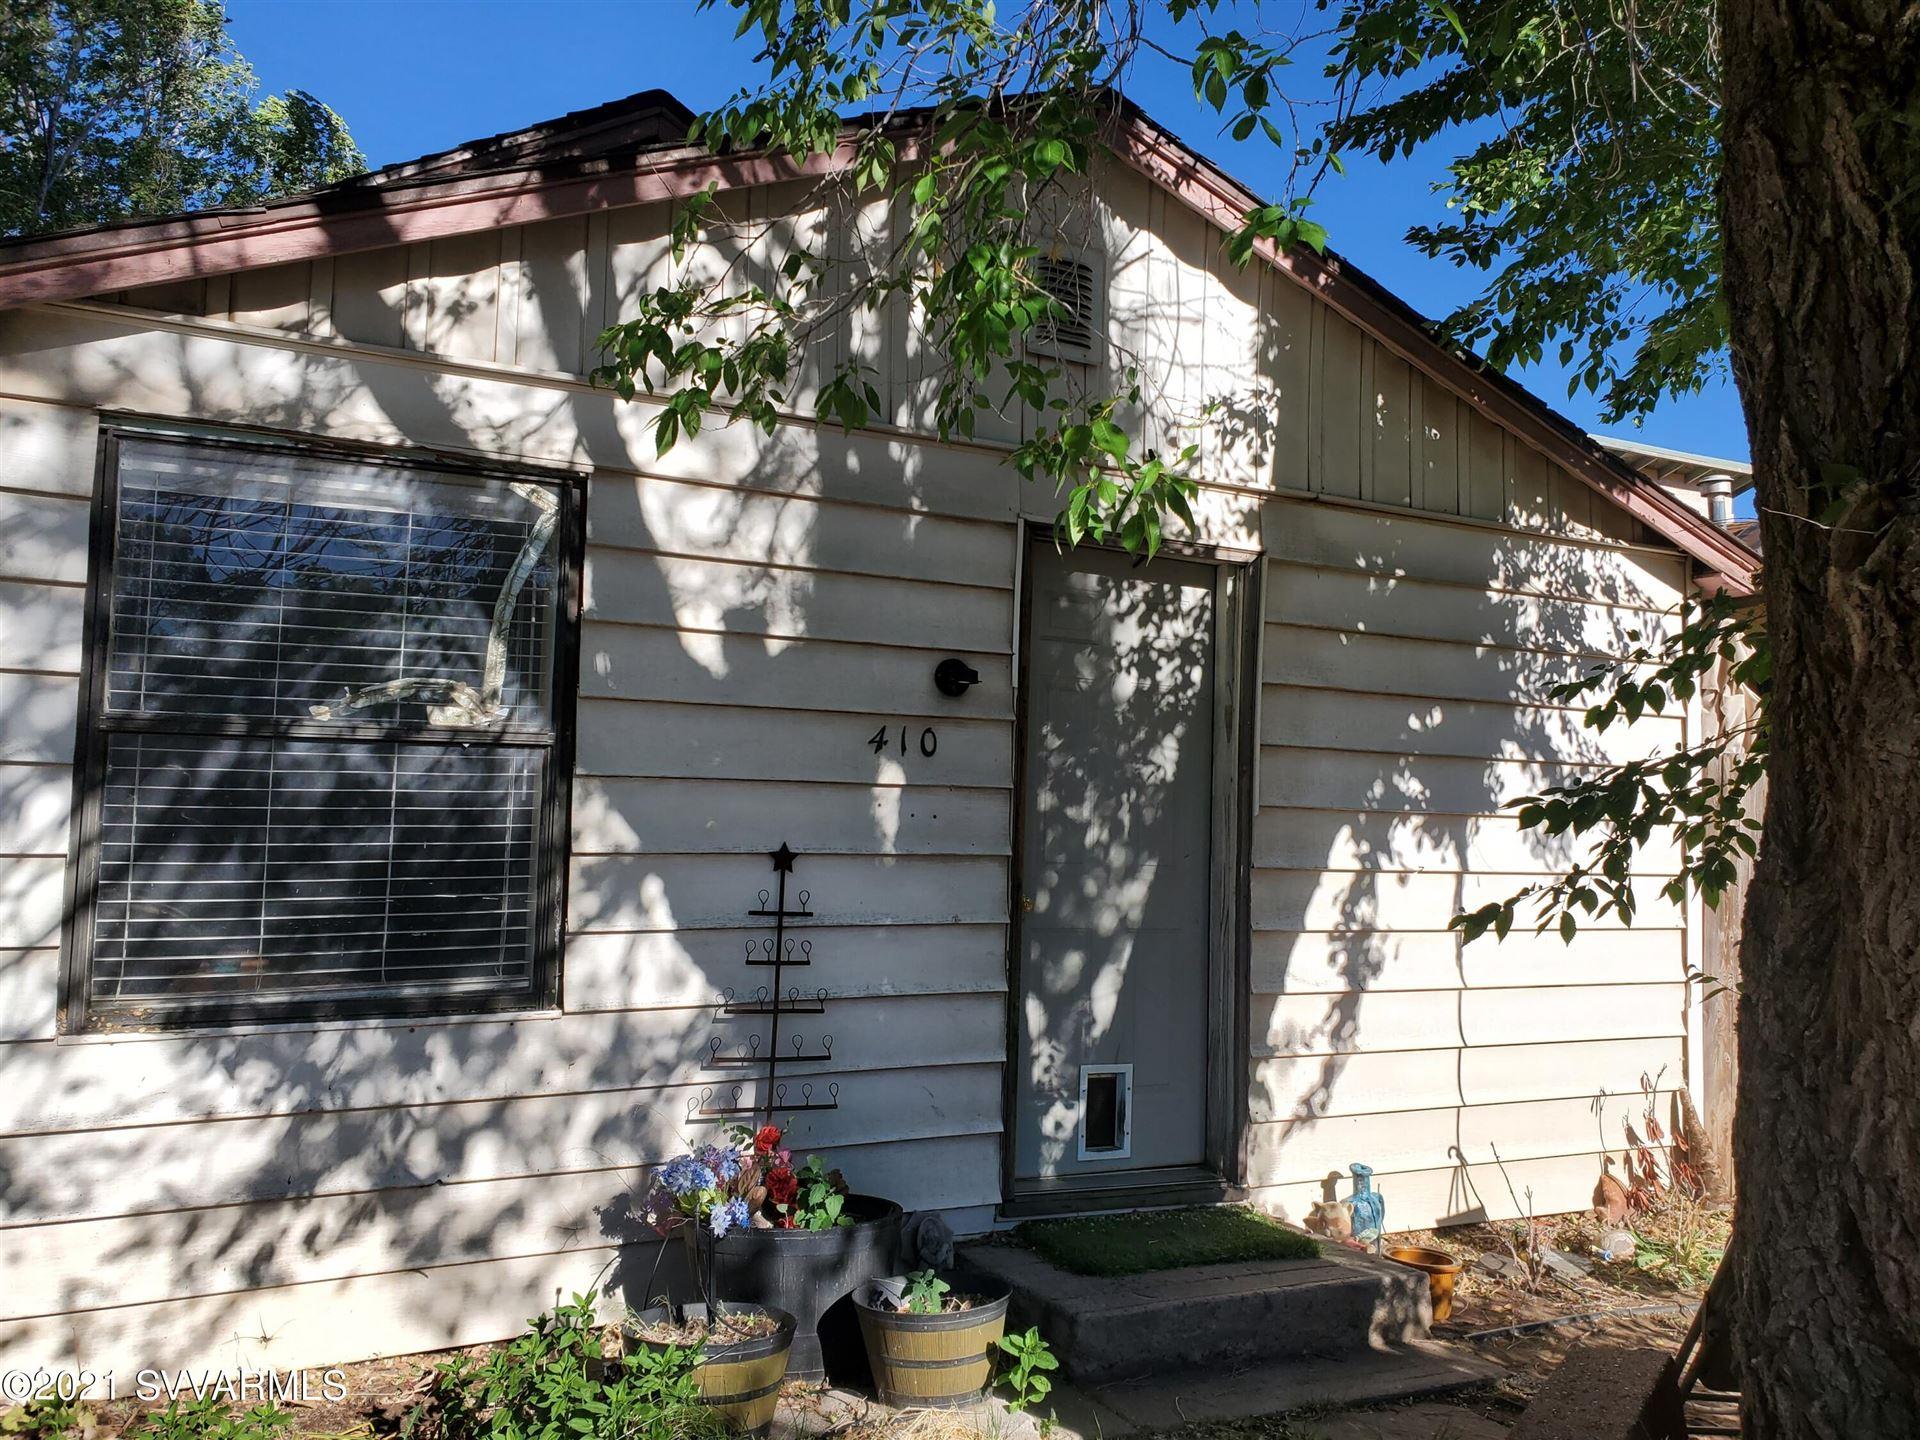 Photo of 410 S San Francisco St, Flagstaff, AZ 86001 (MLS # 526790)